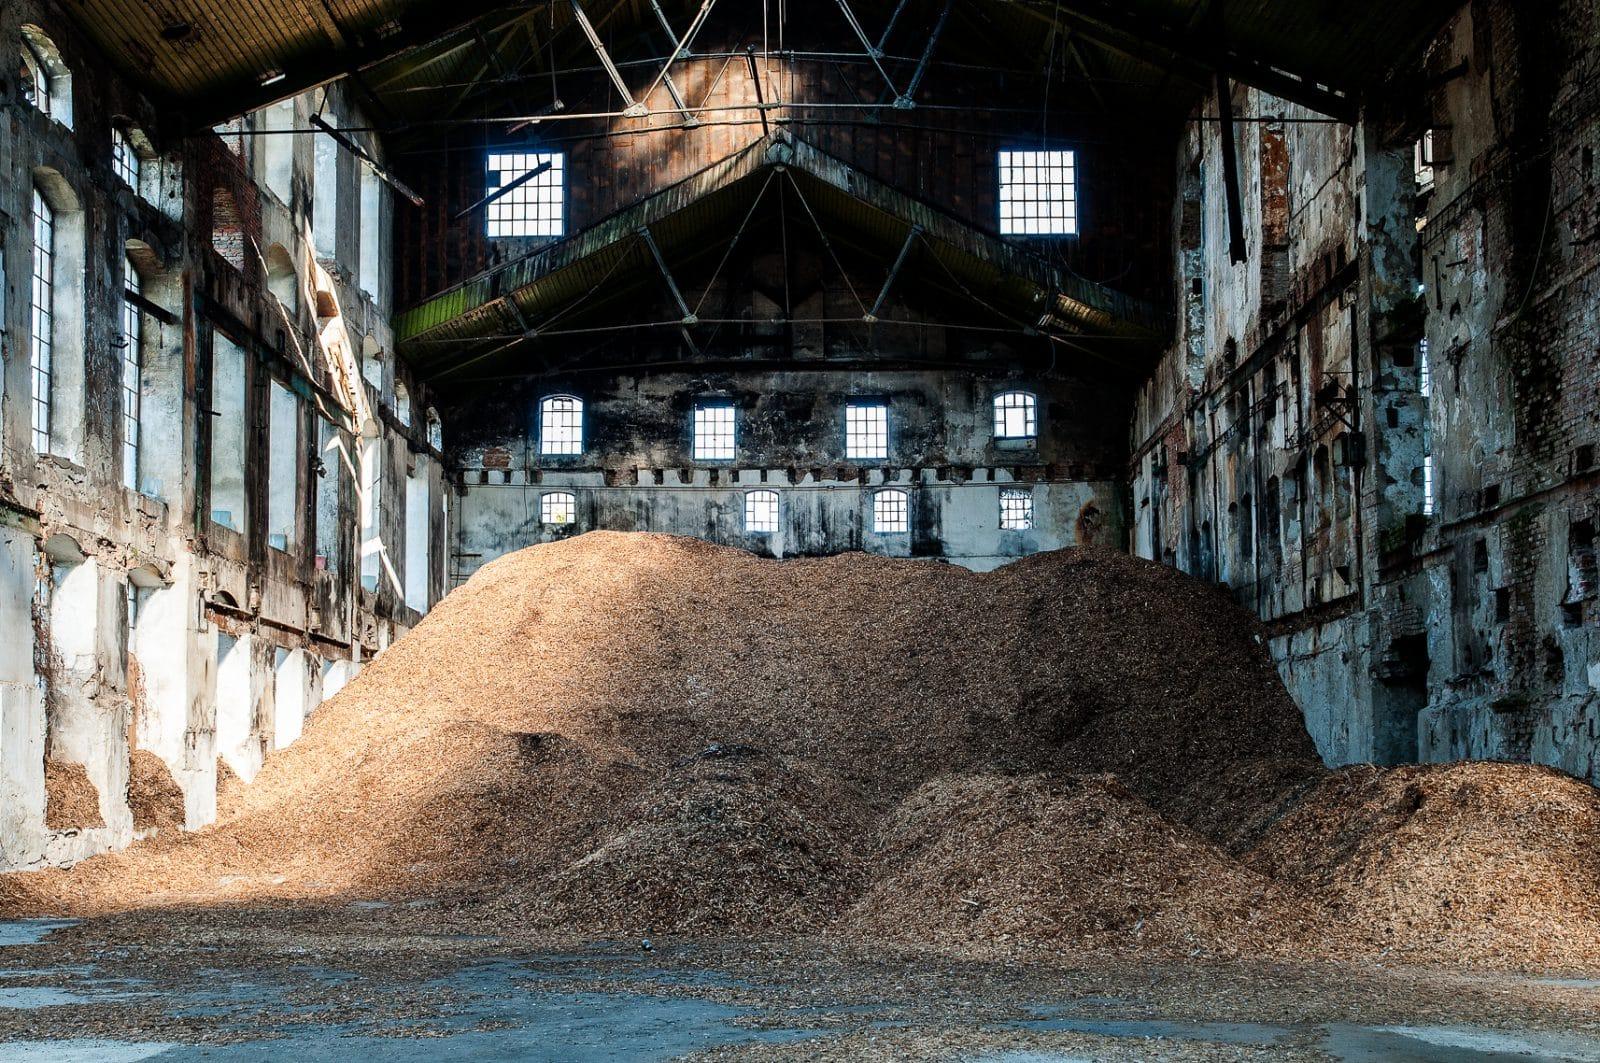 Eastern Sugar project photo by Olja Triaška Stefanović